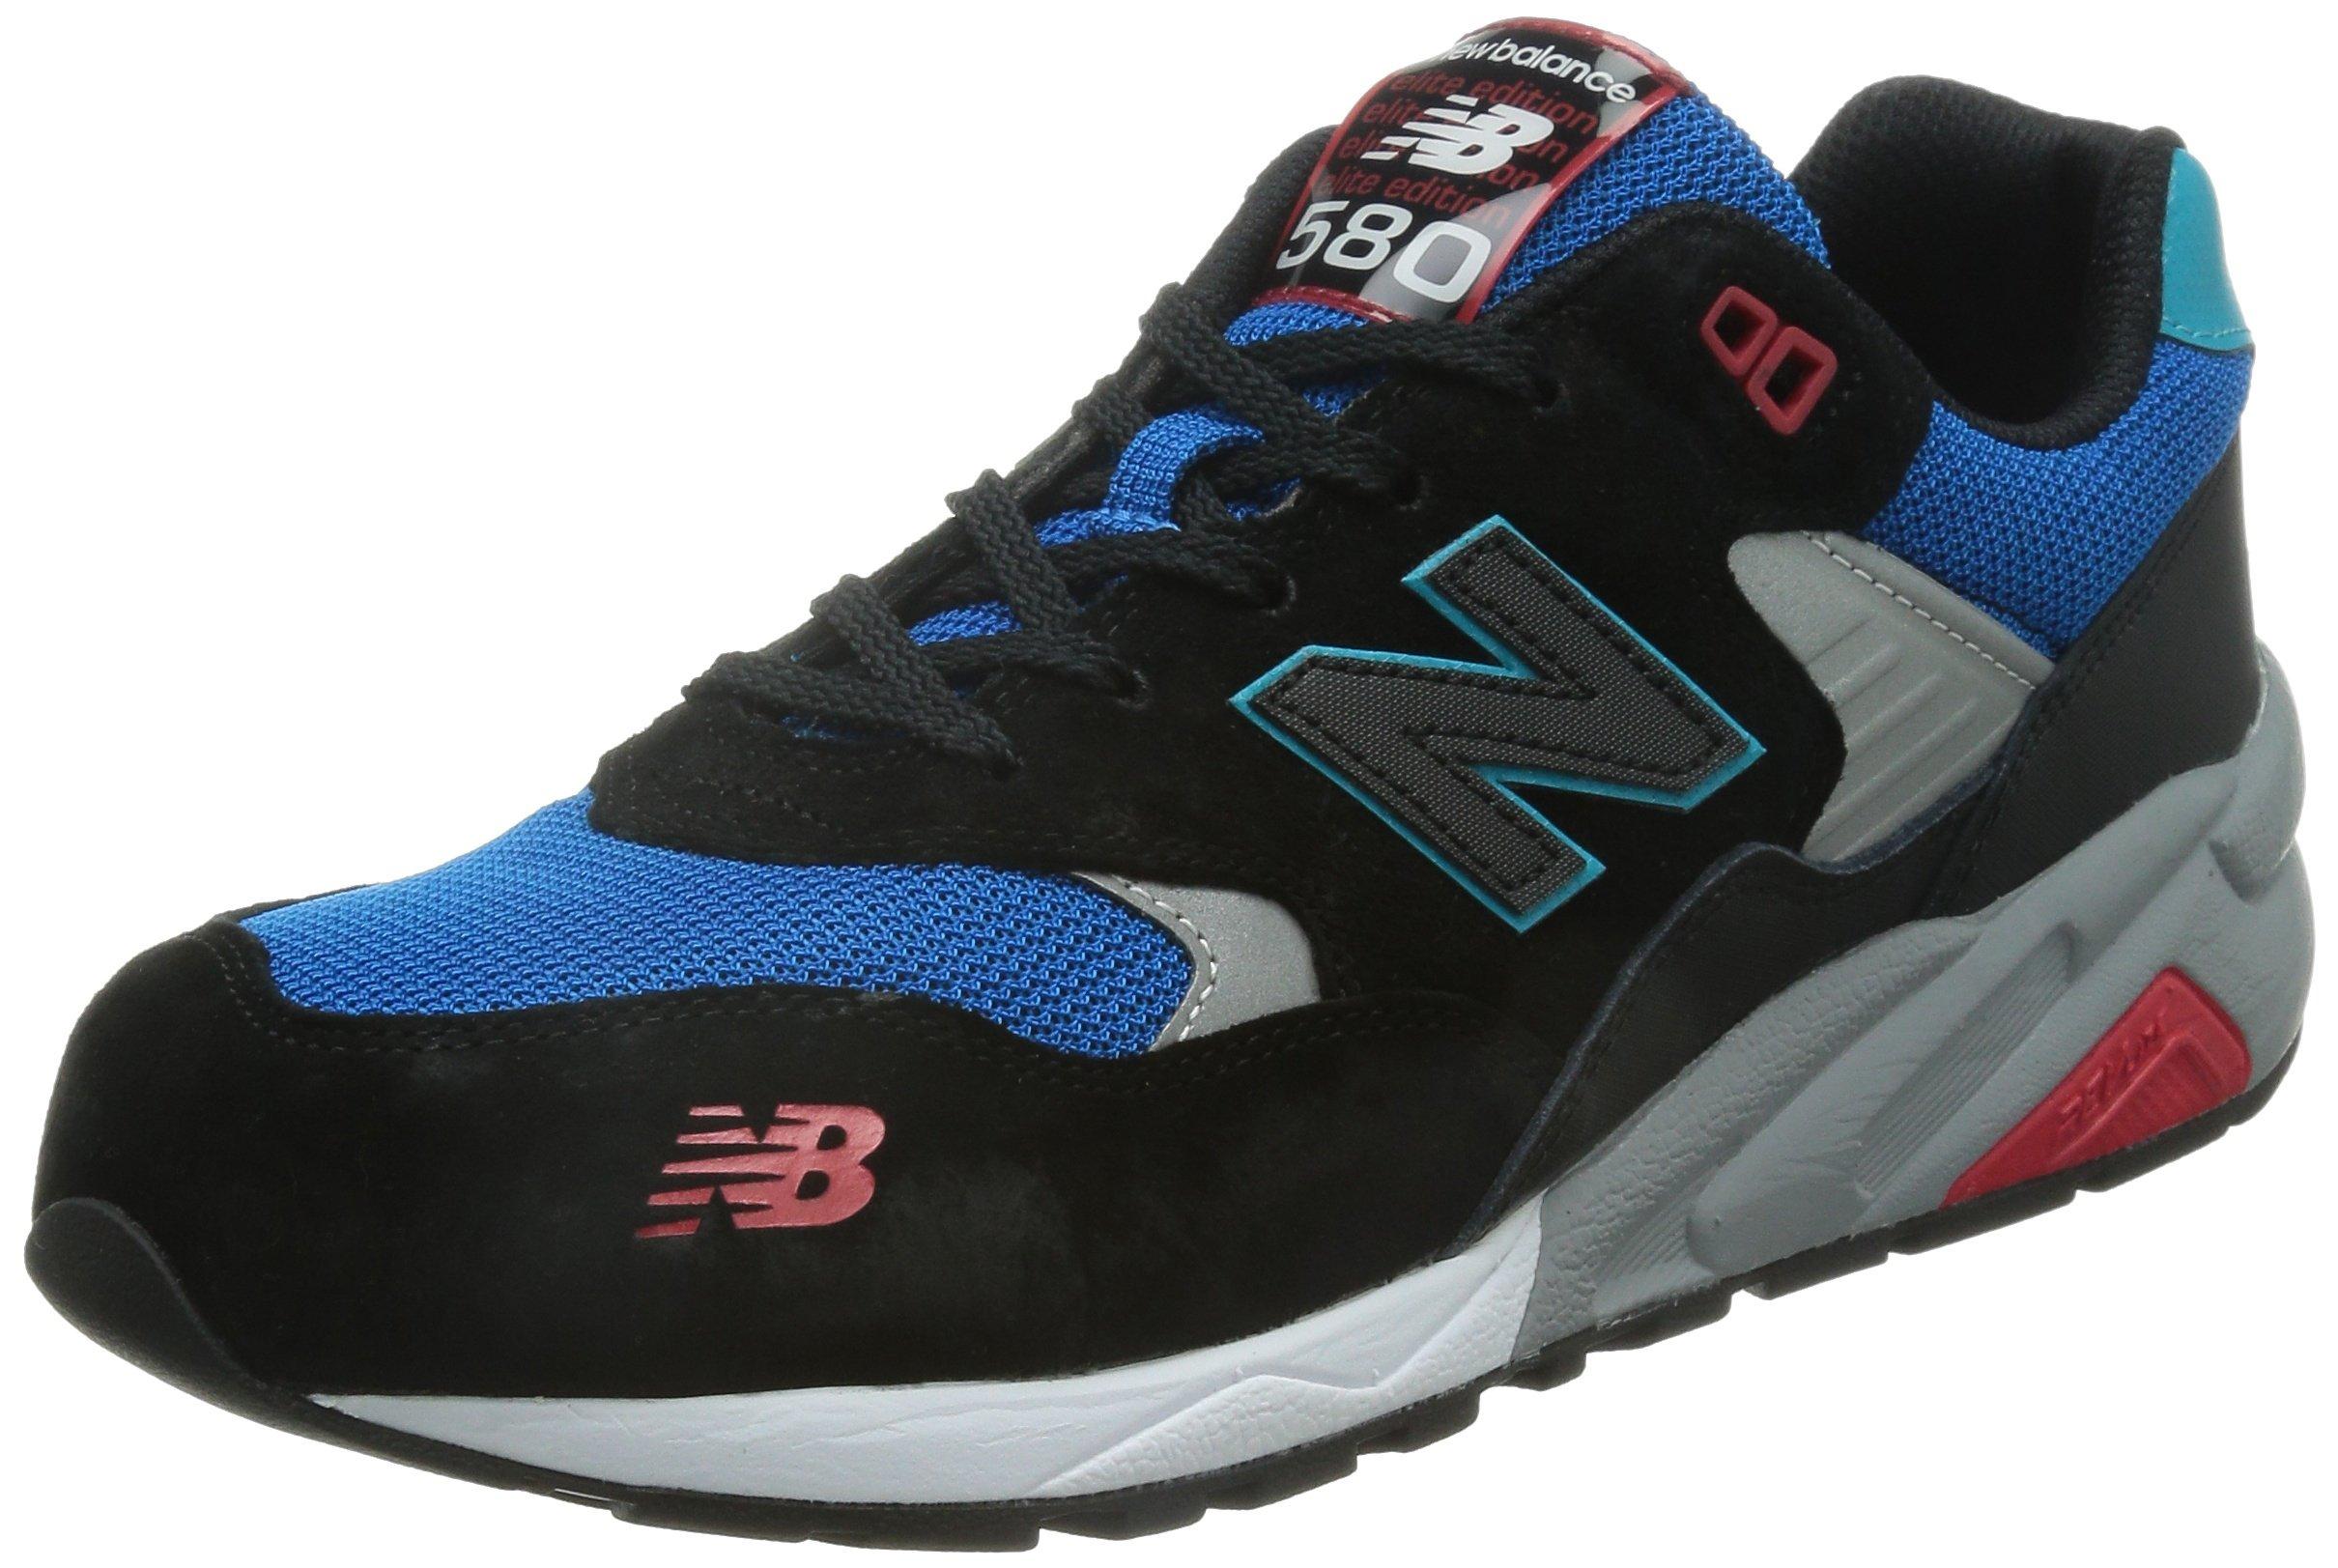 online store ddcd5 d9db5 New Balance Mens Sneakers 580 Elite Edition Pinball Black Blue Red MRT580BF